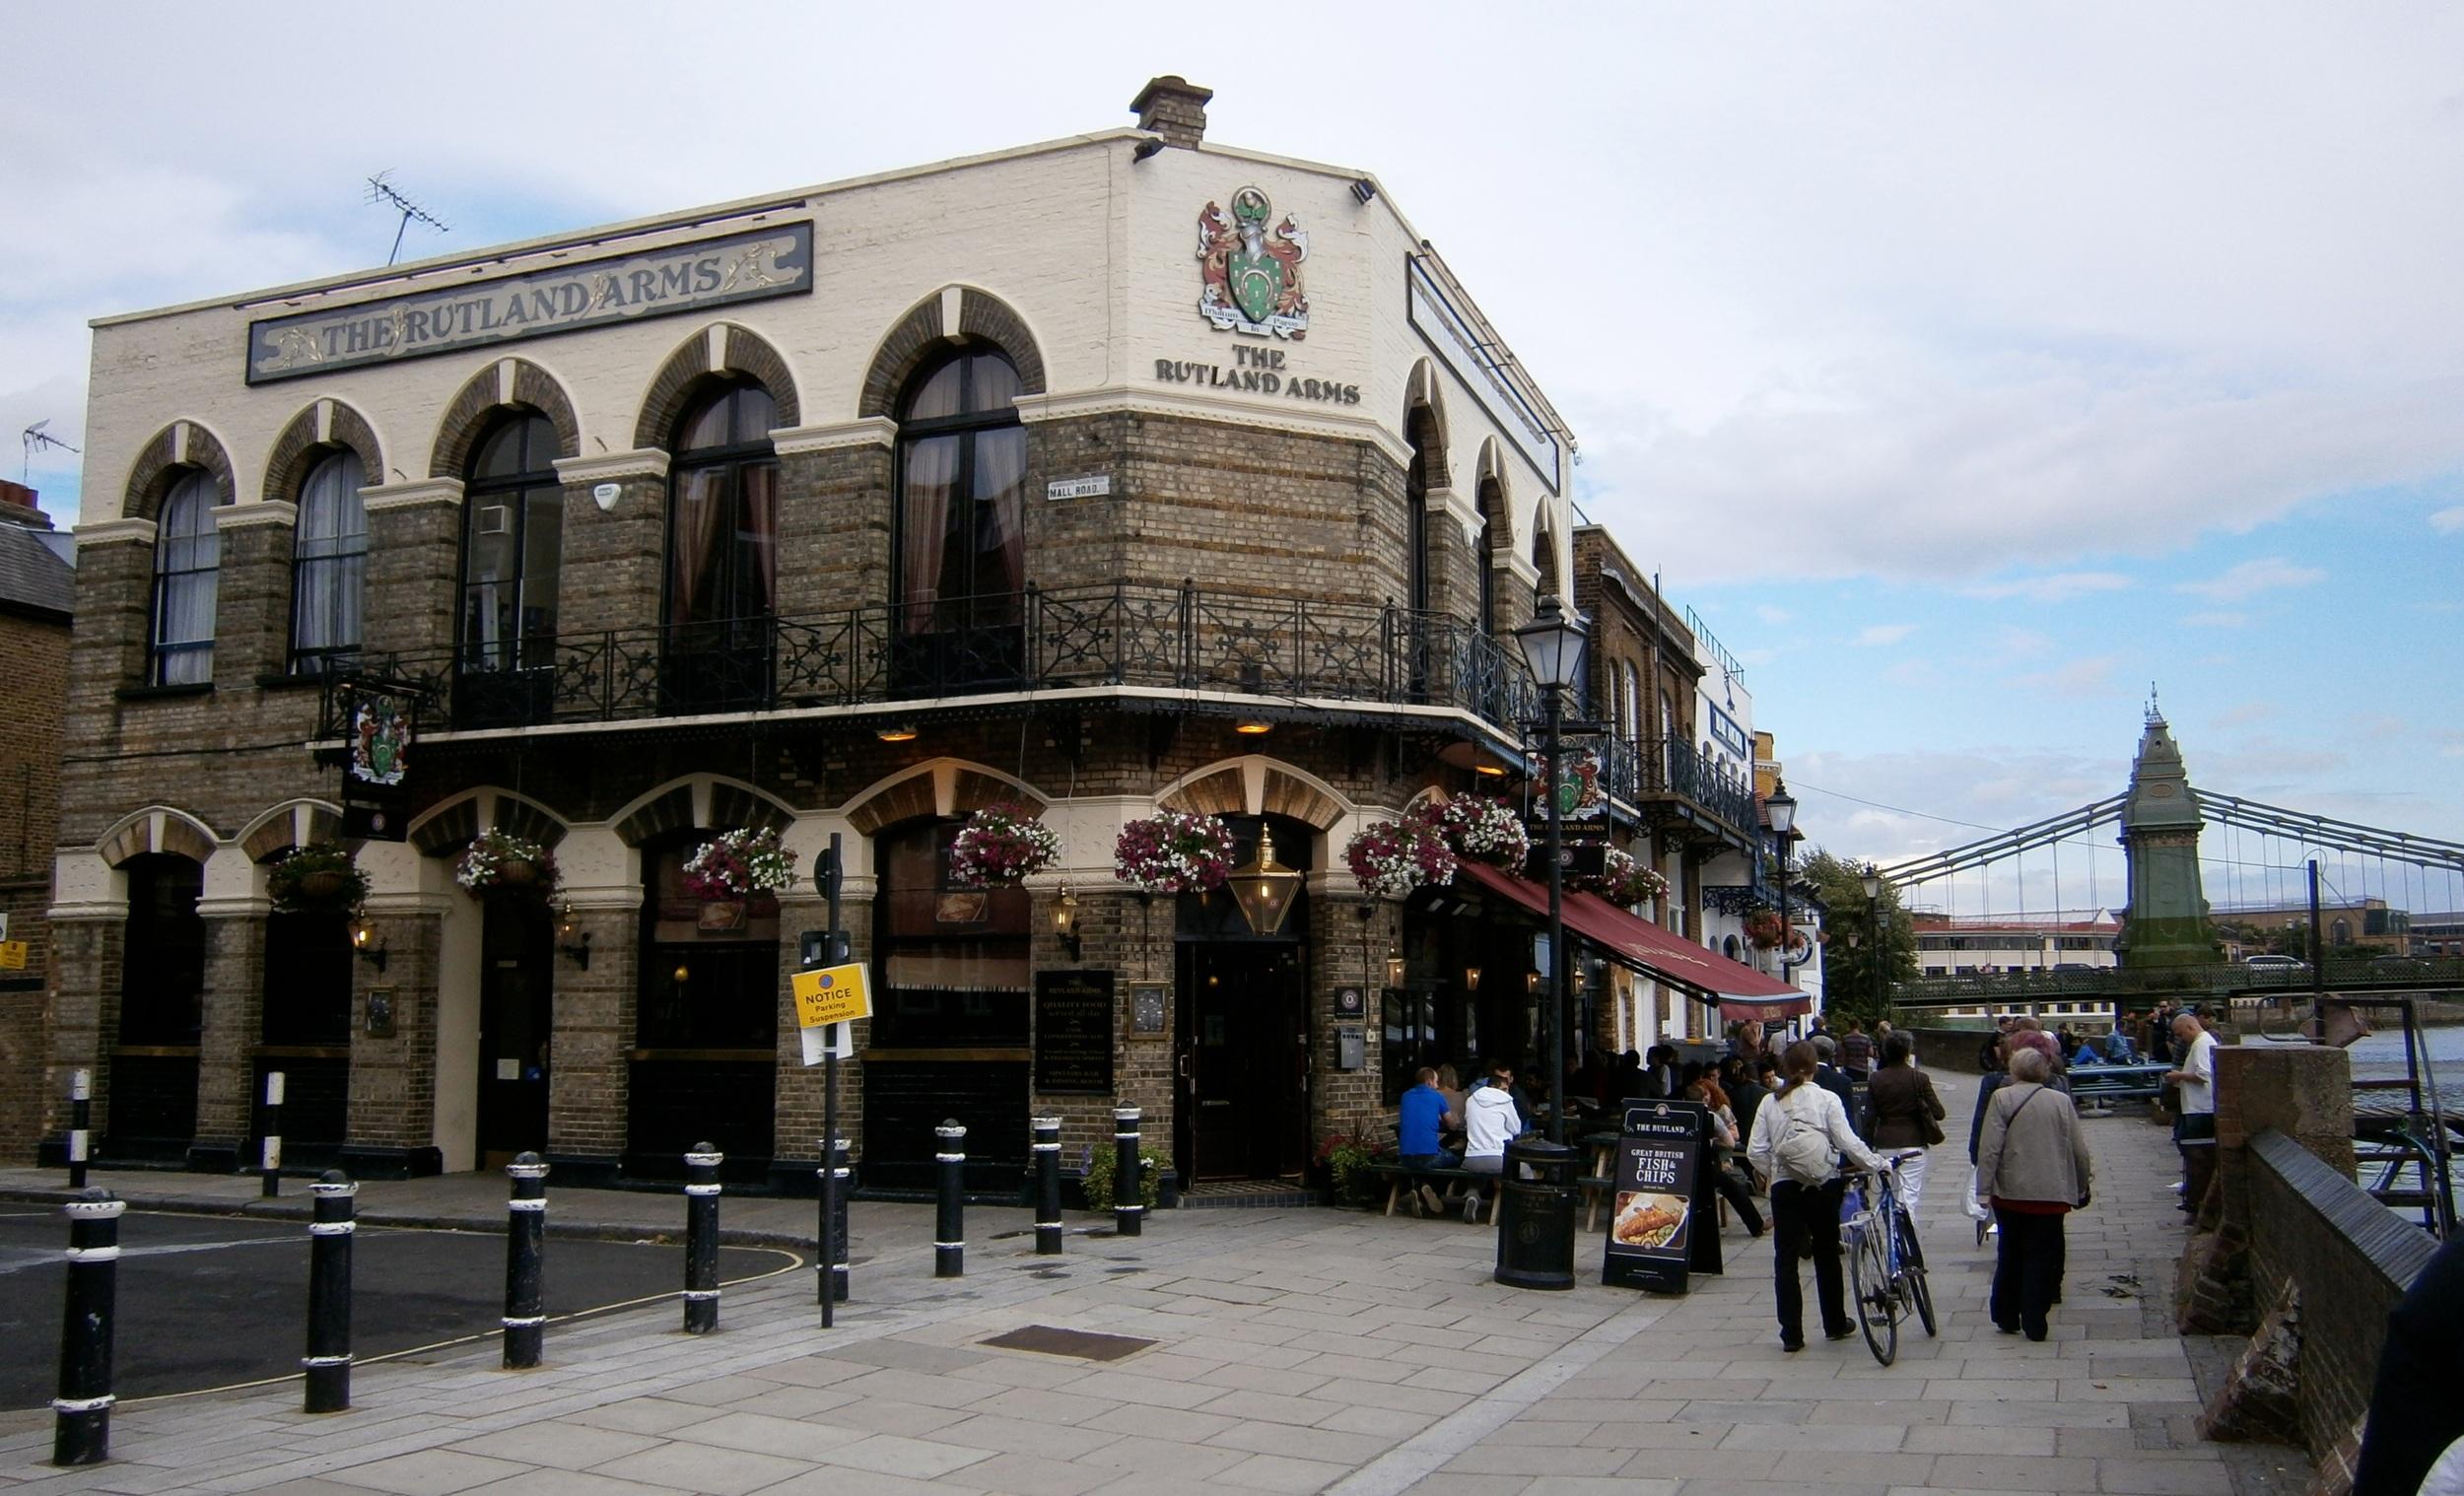 Rutland Arms, 15 di Lower Mall, Hammersmith, London. Foto di R. N. Foster